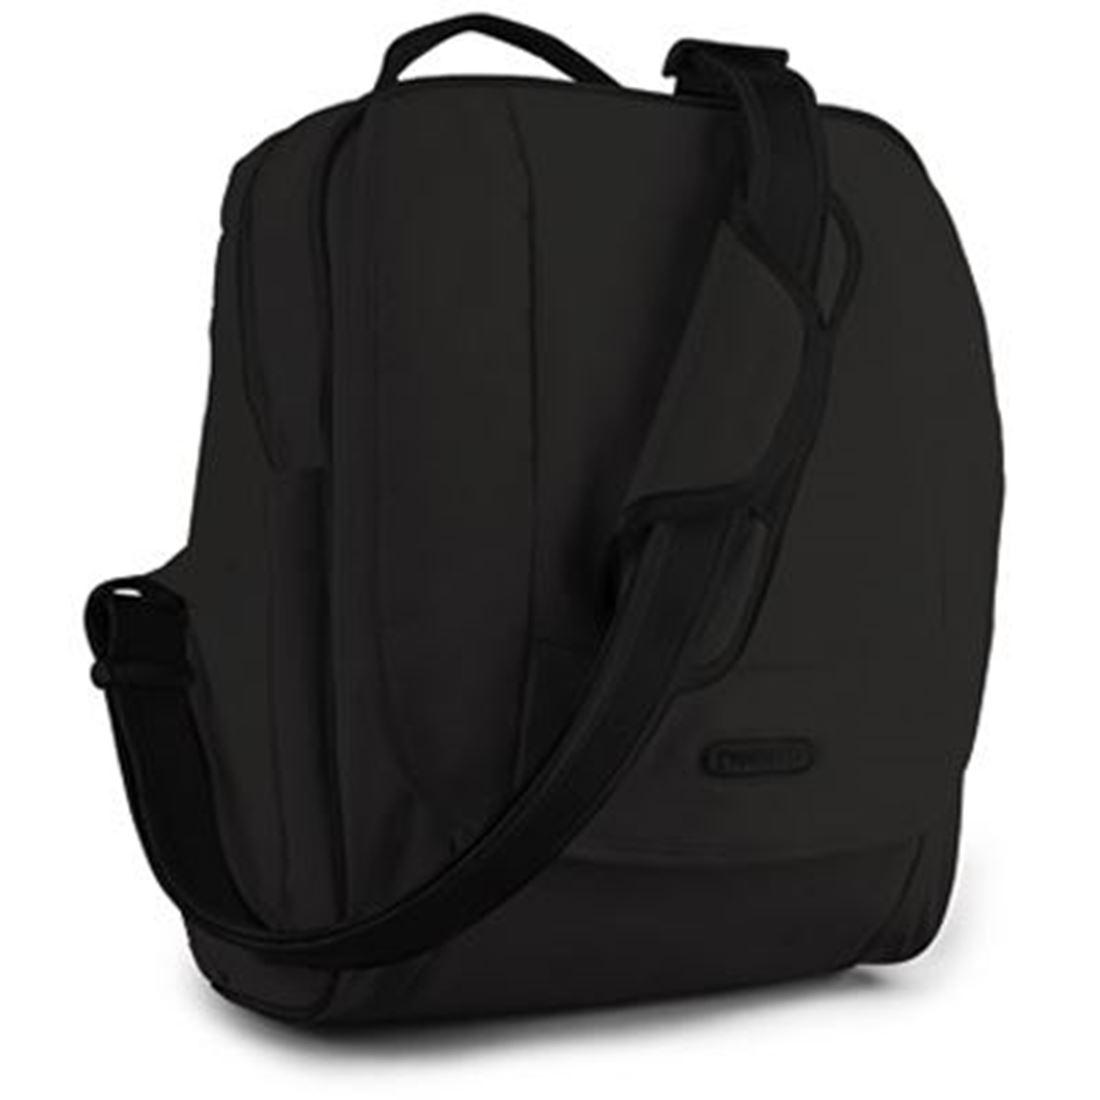 Picture of Pacsafe Metrosafe 300 GII Laptop Bag - Black